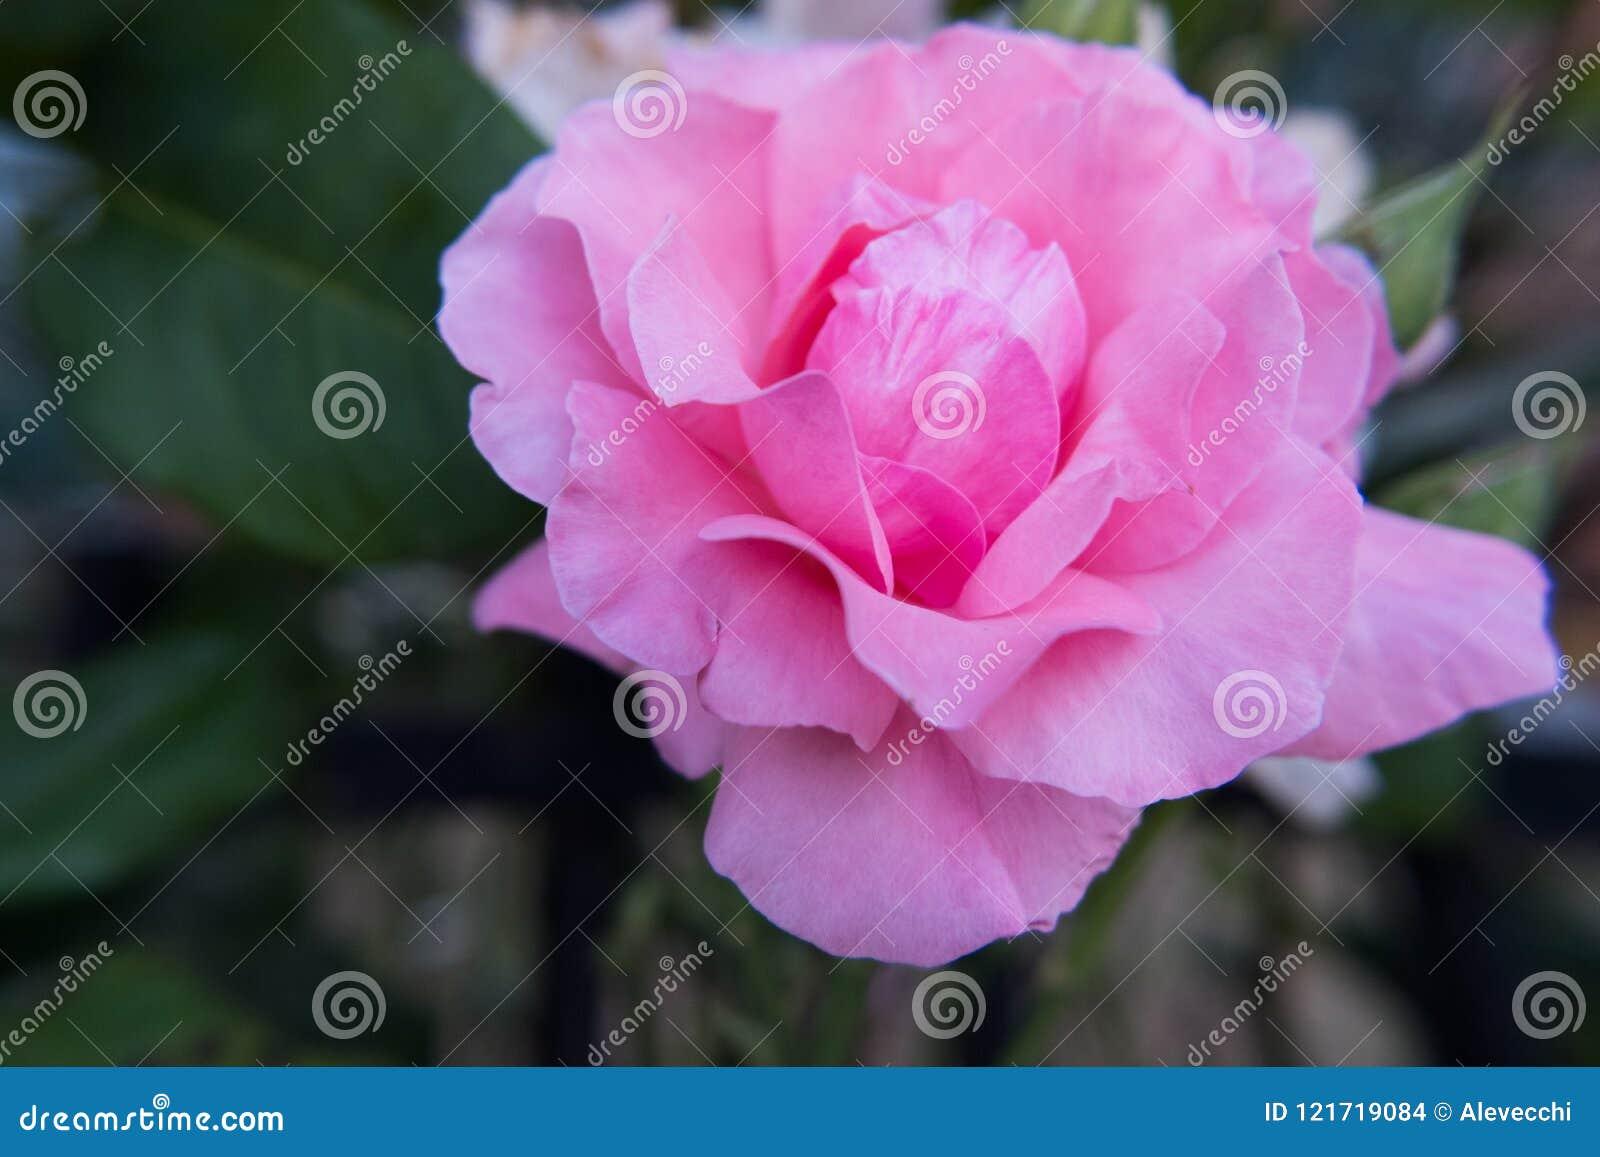 Light Pink Rose Flower Stock Photo Image Of Autumn 121719084